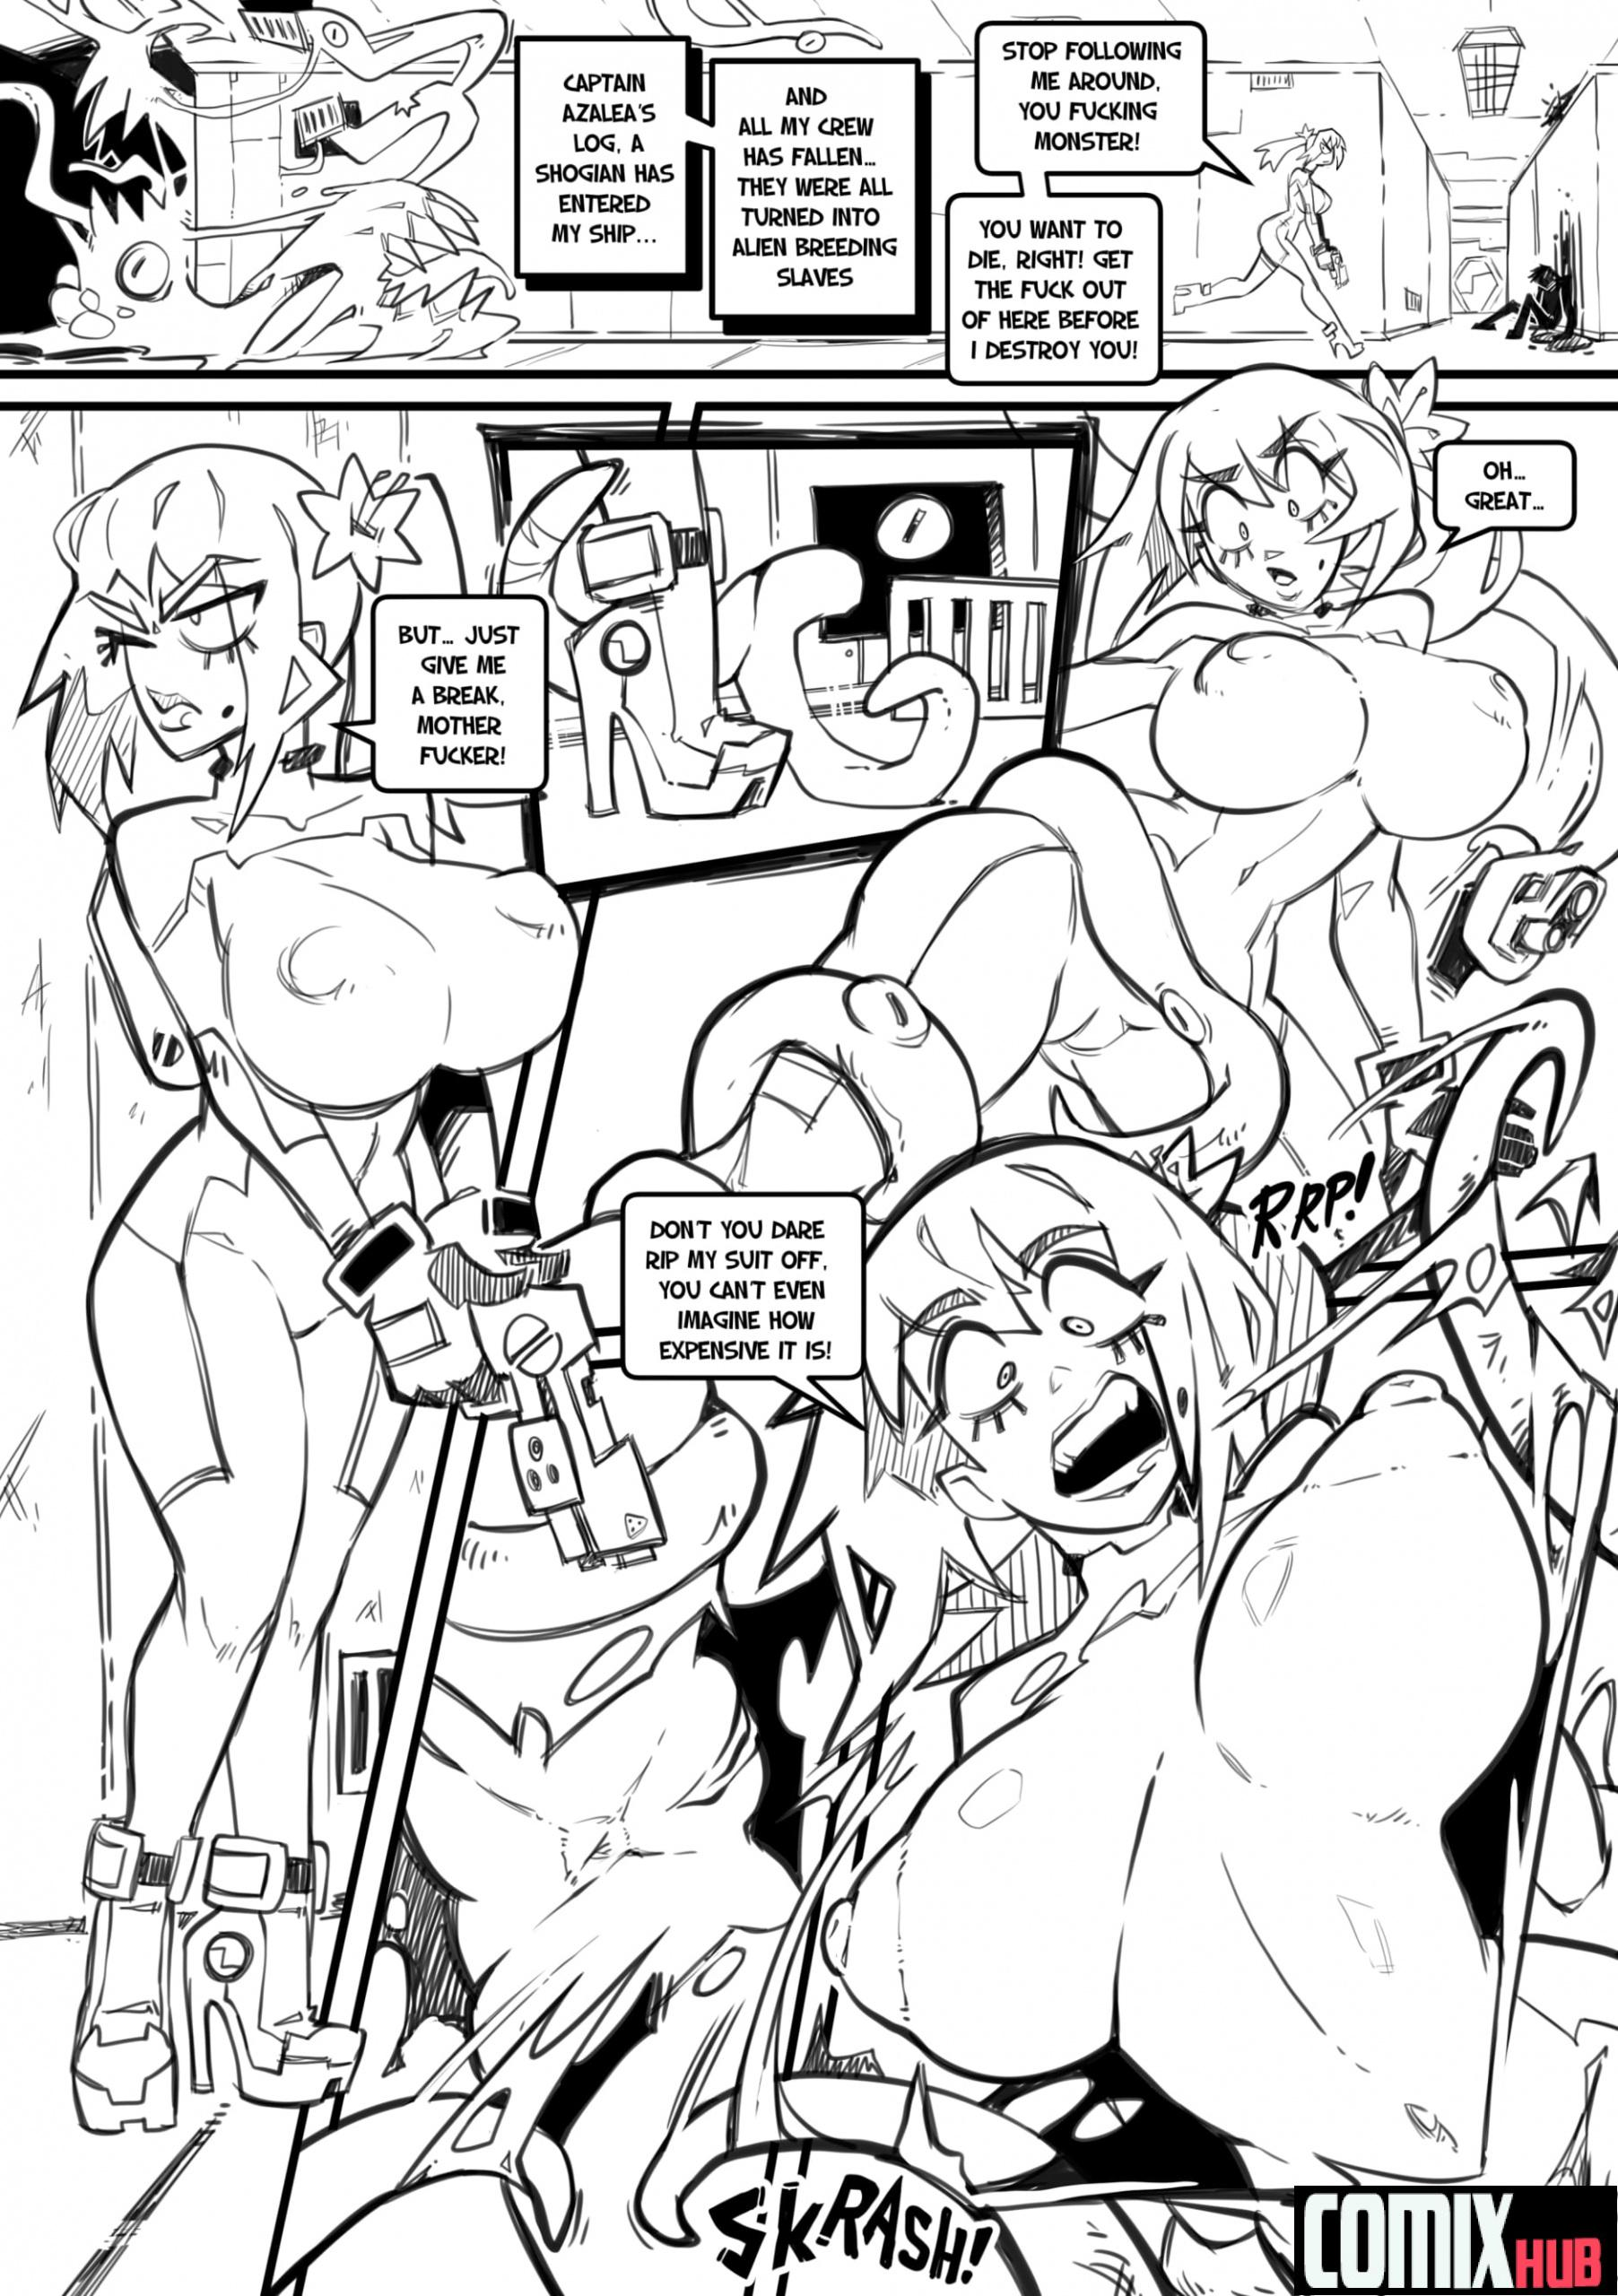 Skarpworld 10: Milk Crisis 4 - Gravity Oral sex, Anal Sex, Big Tits, Blowjob, Creampie, Cum Shots, Deformed, Double Penetration, Group Sex, Stockings, Straight, Tentacles, Titfuck, X-Ray